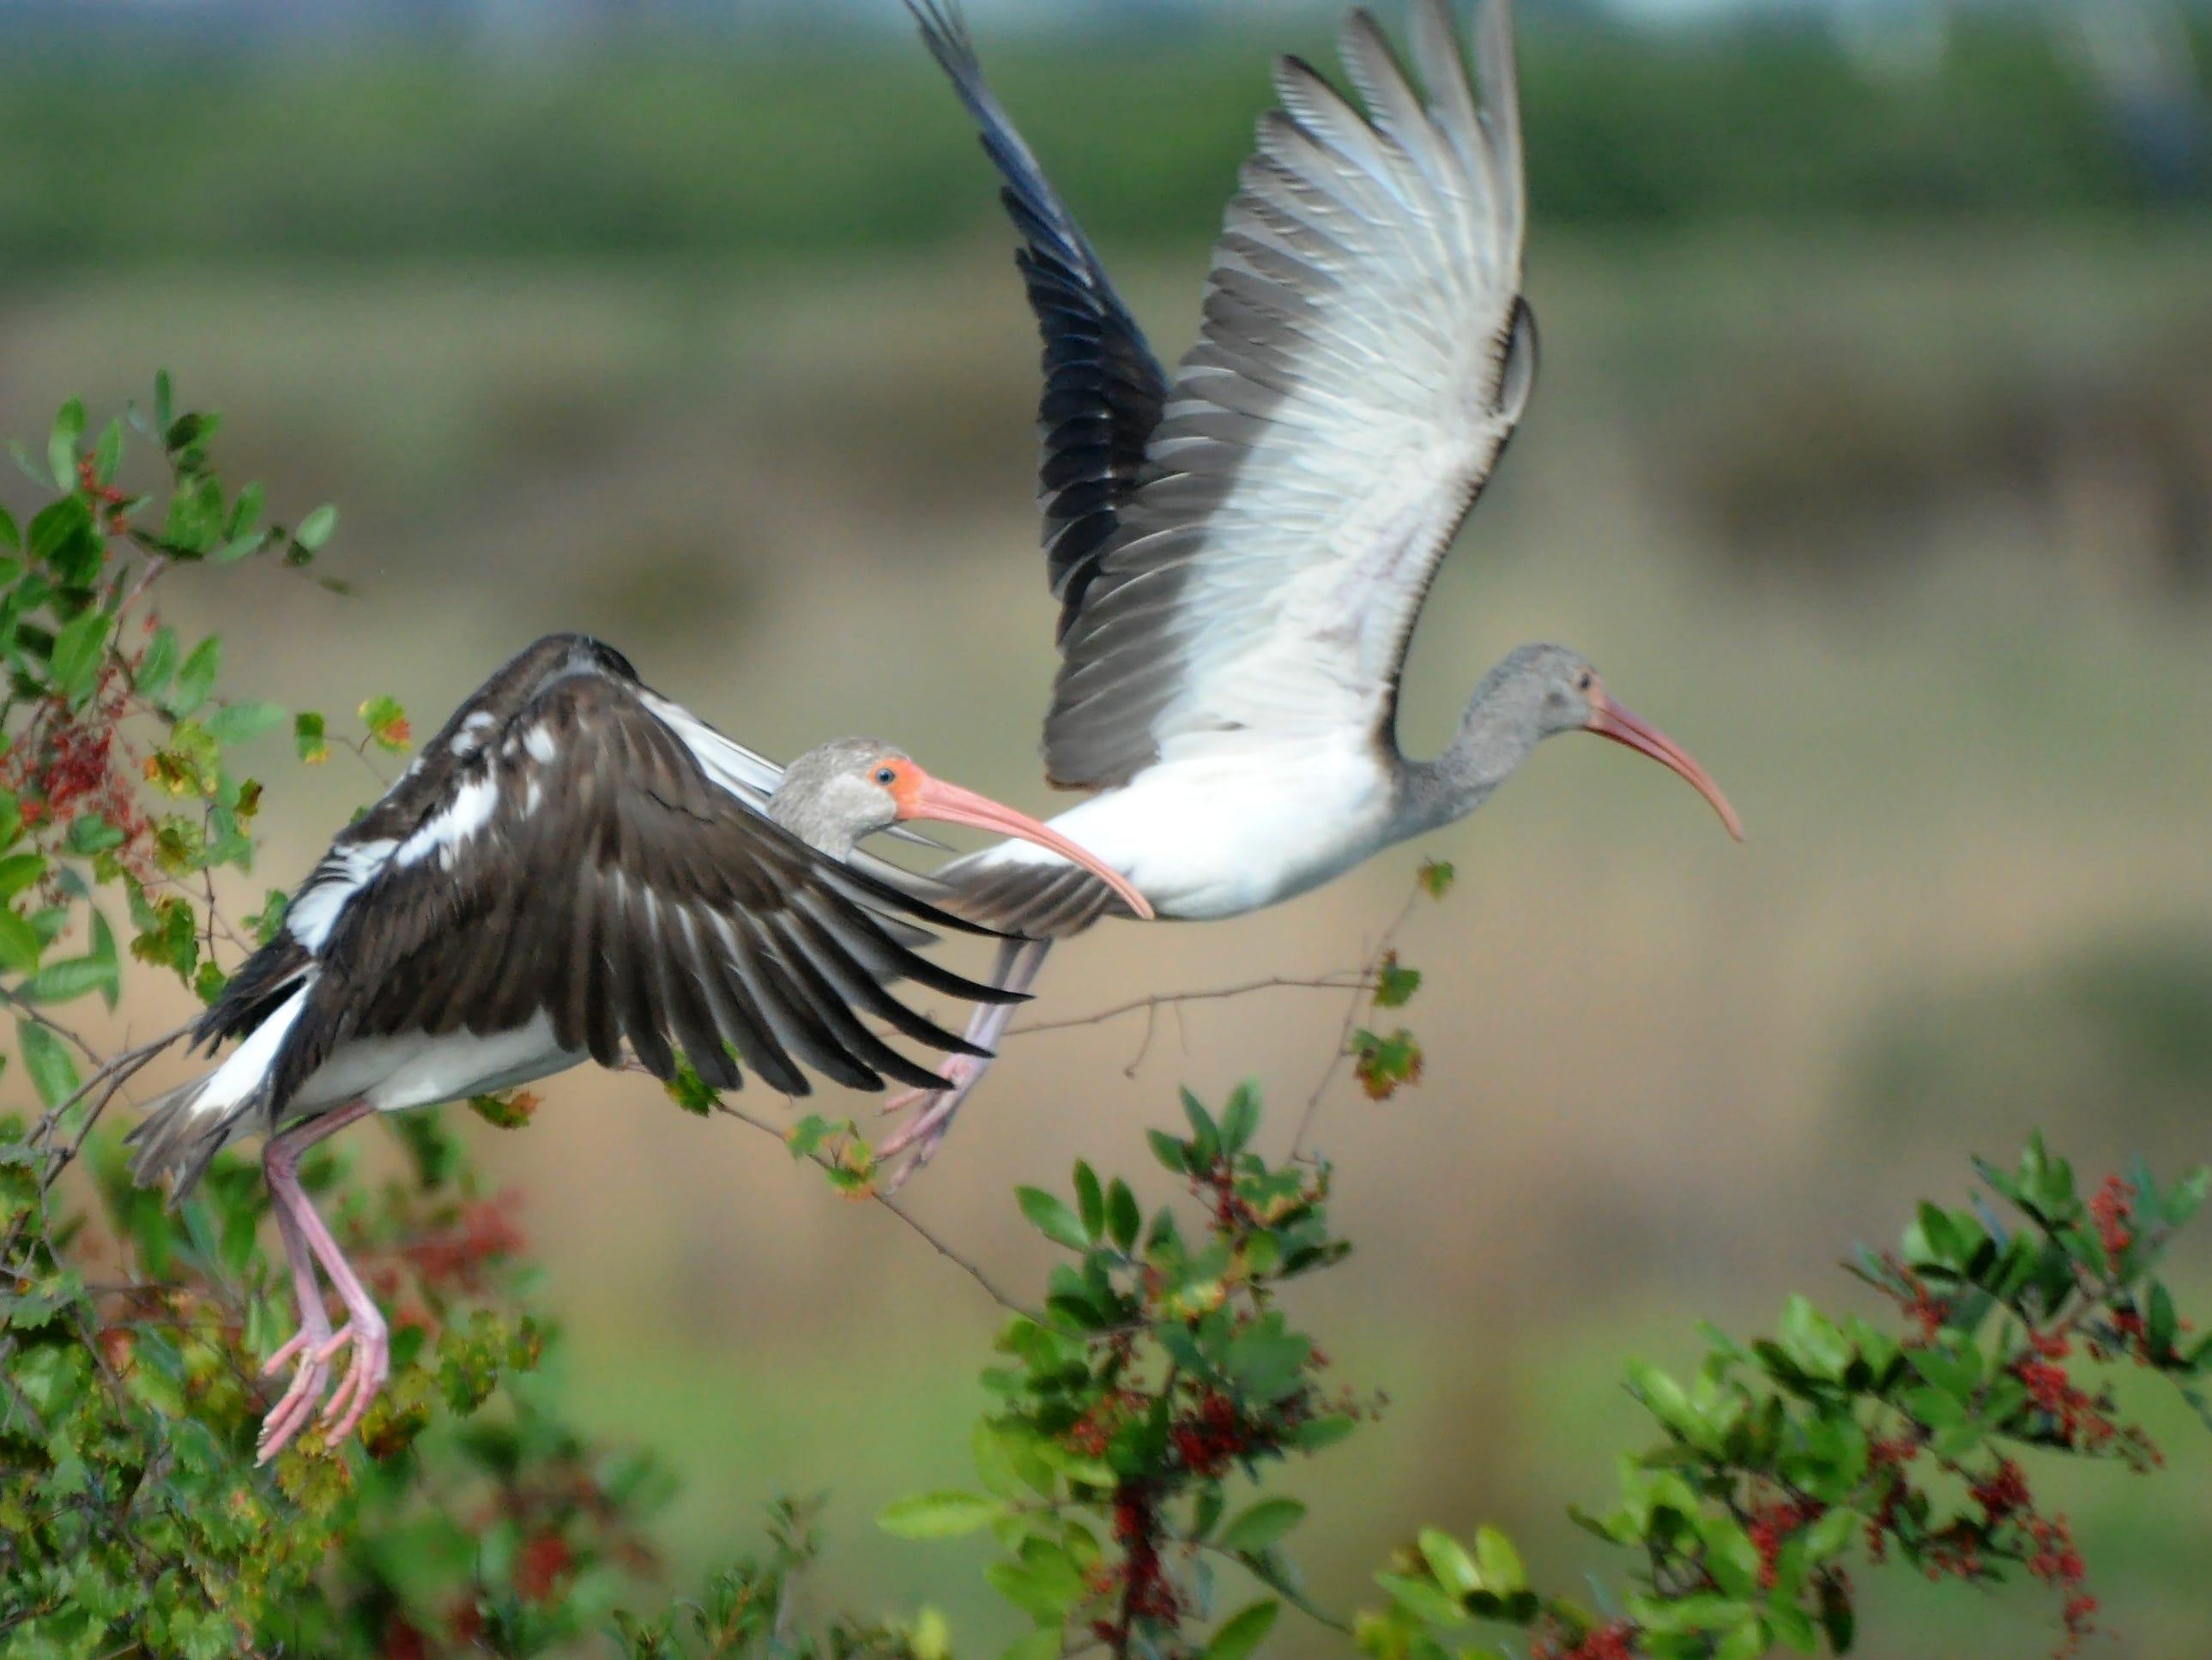 Immature white ibis take flight in Corkscrew Swamp Sanctuary.